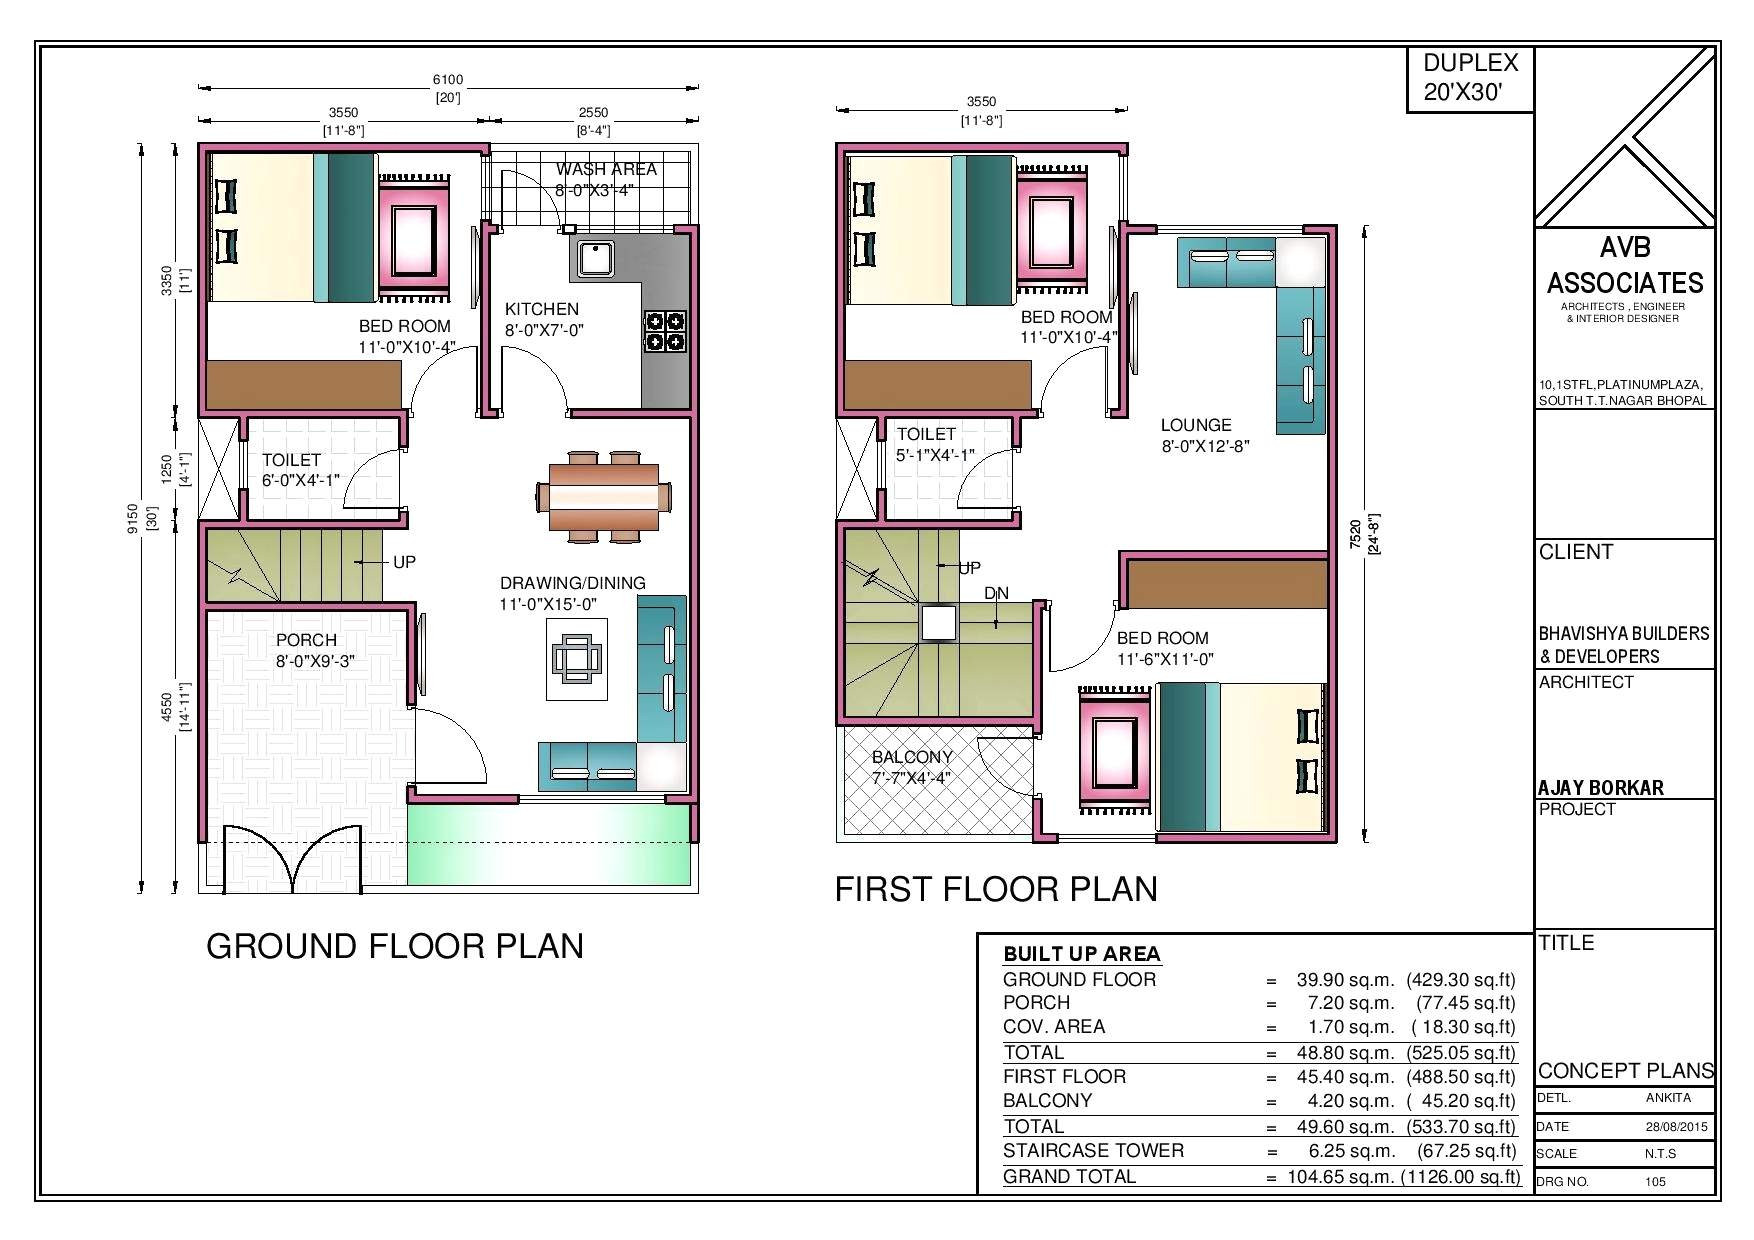 20 x 40 duplex house plans north facing